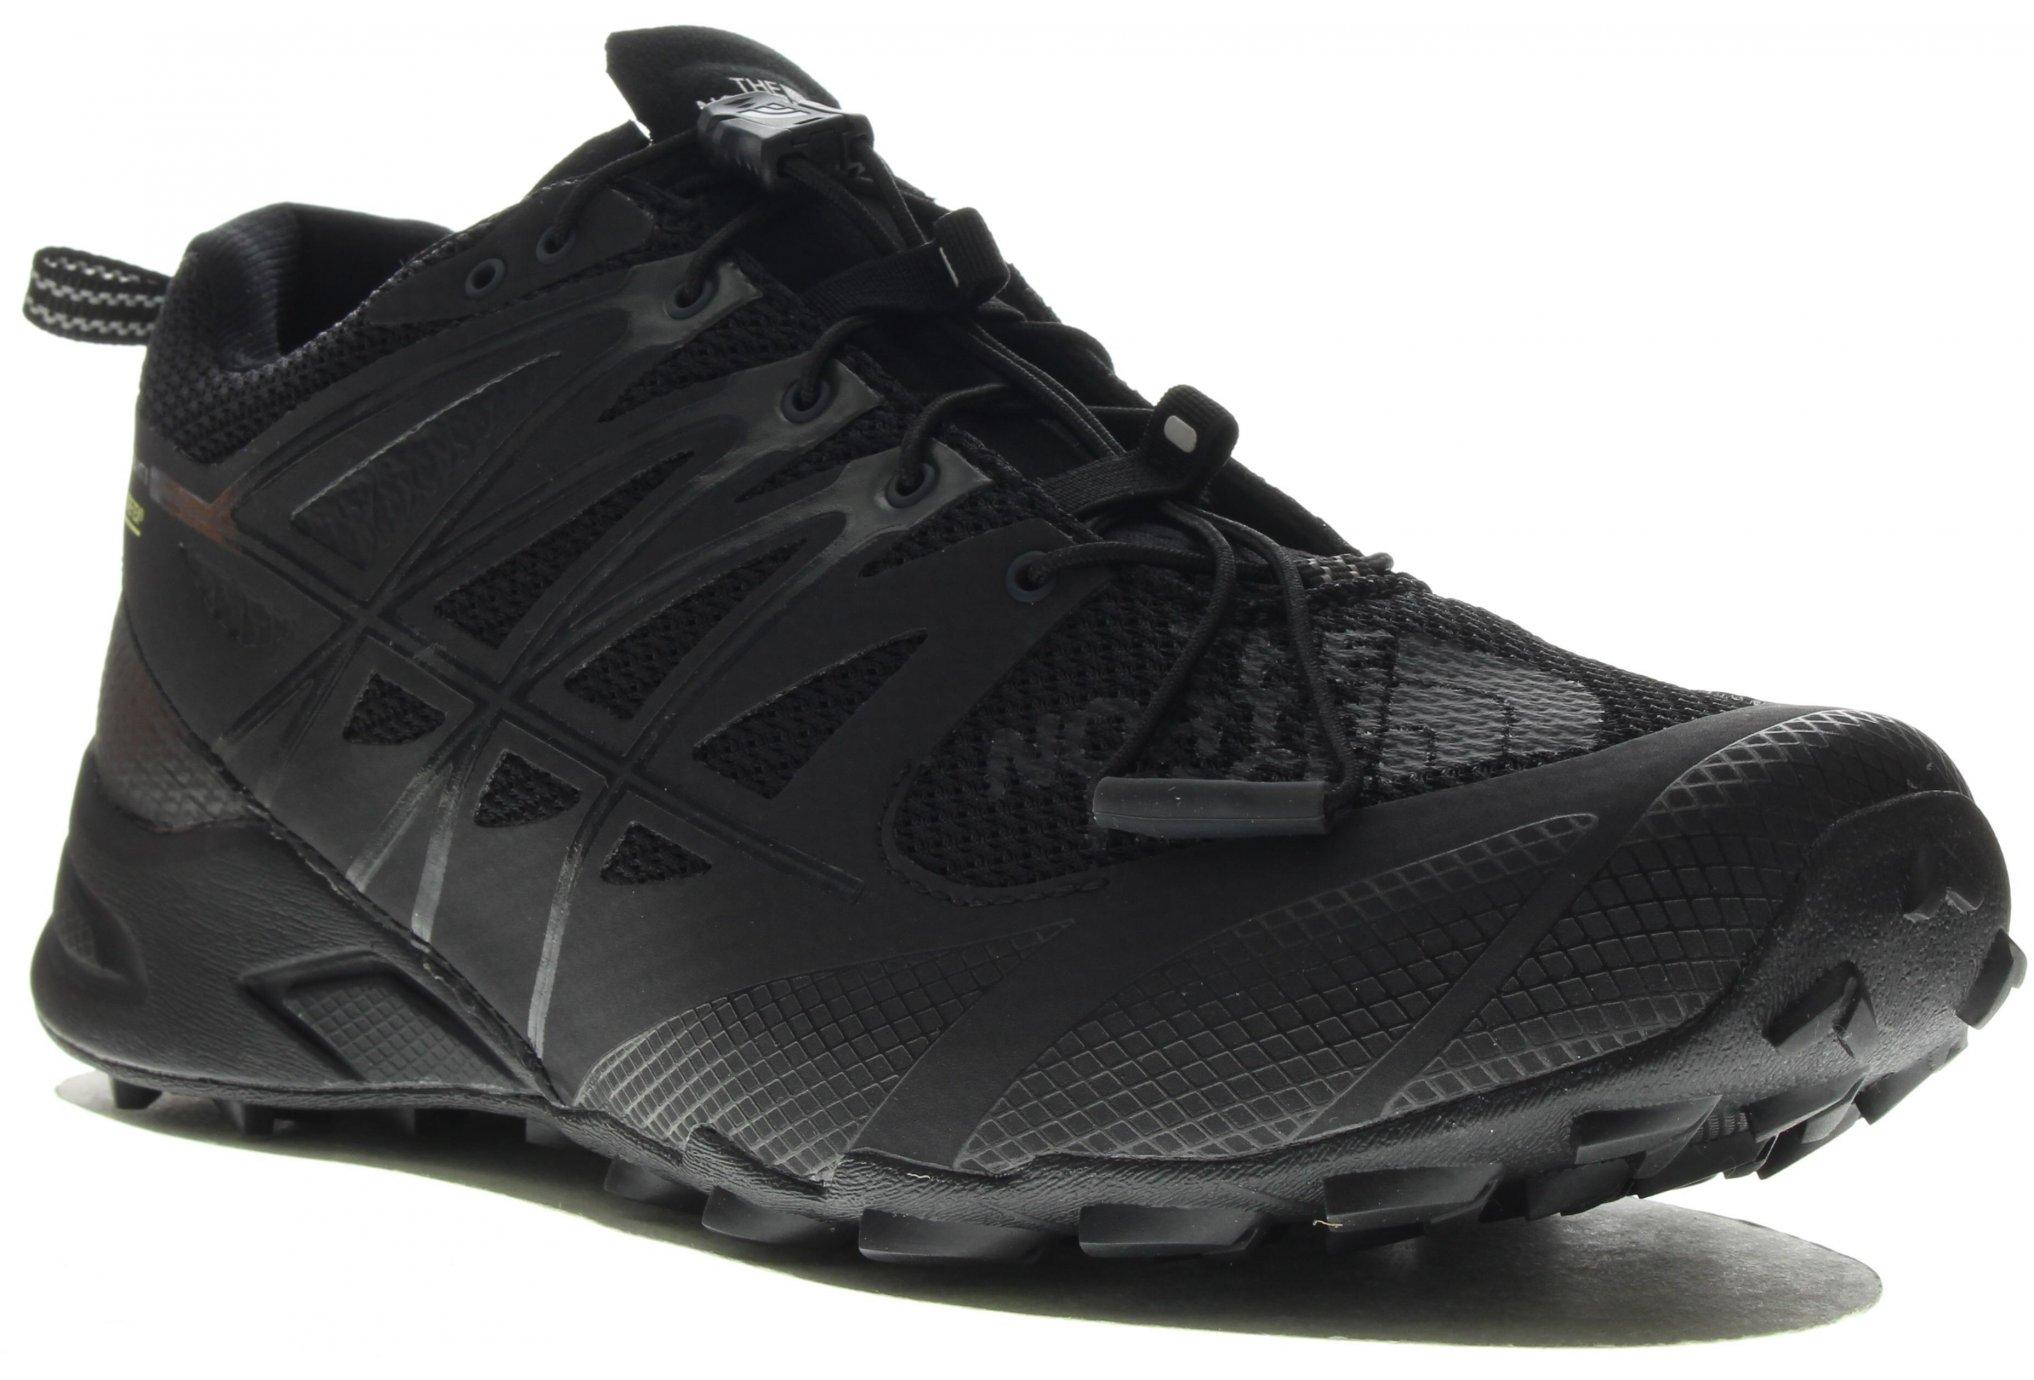 The North Face Ultra MT II Gore-Tex M Diététique Chaussures homme